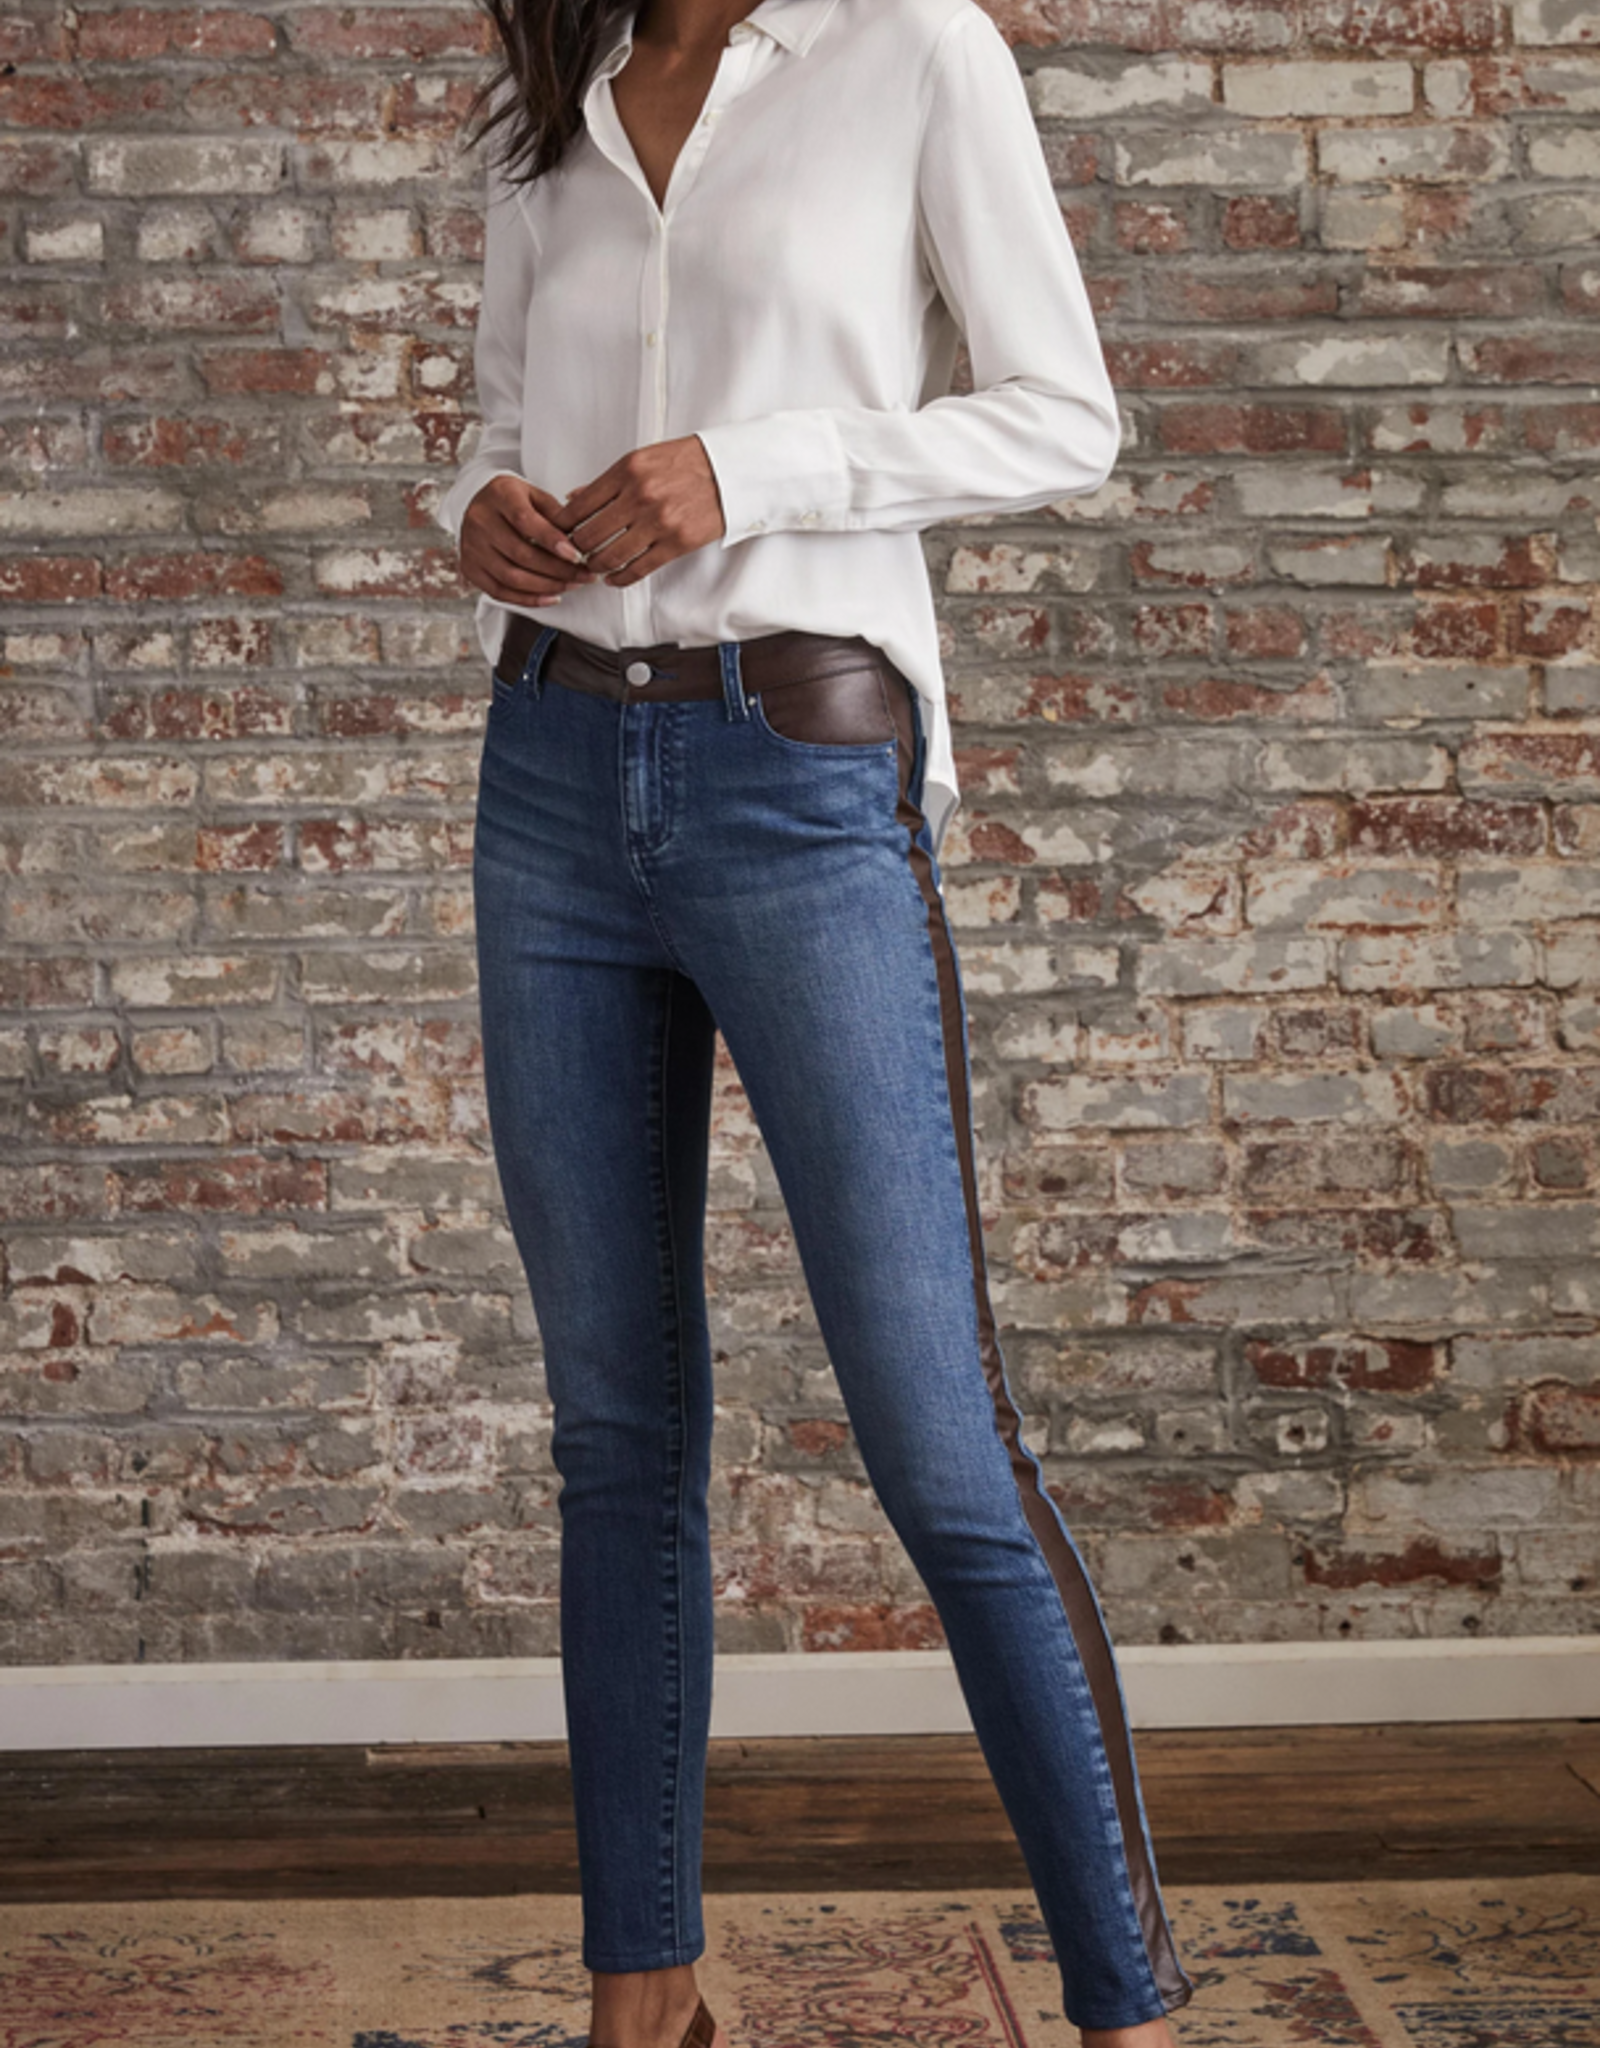 Los Feliz pocket/leather jeans